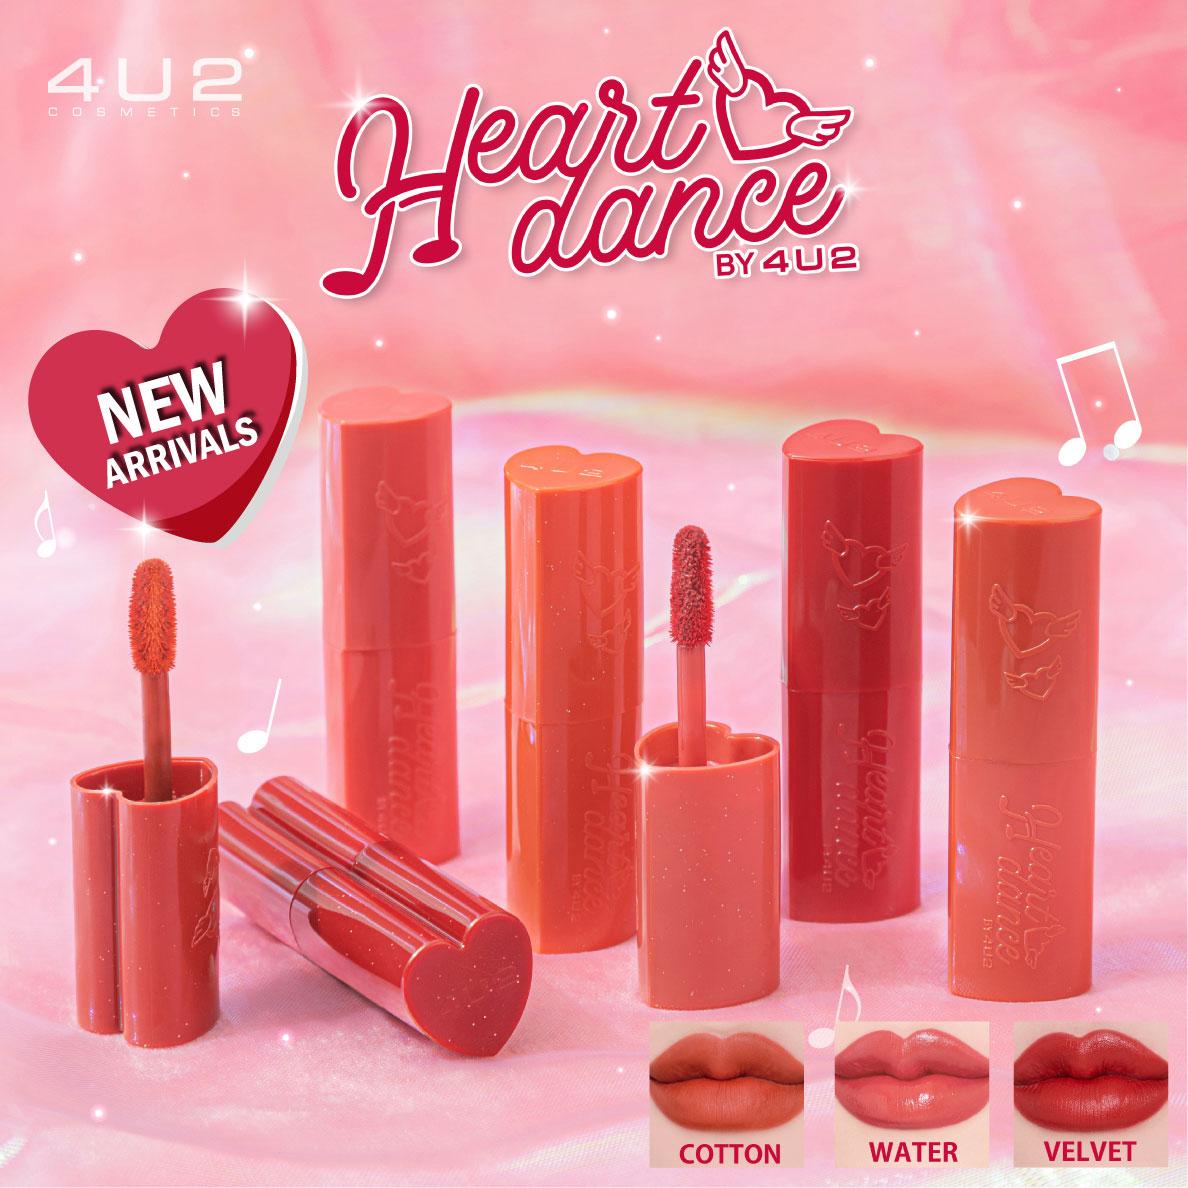 4U2 Heart Dance